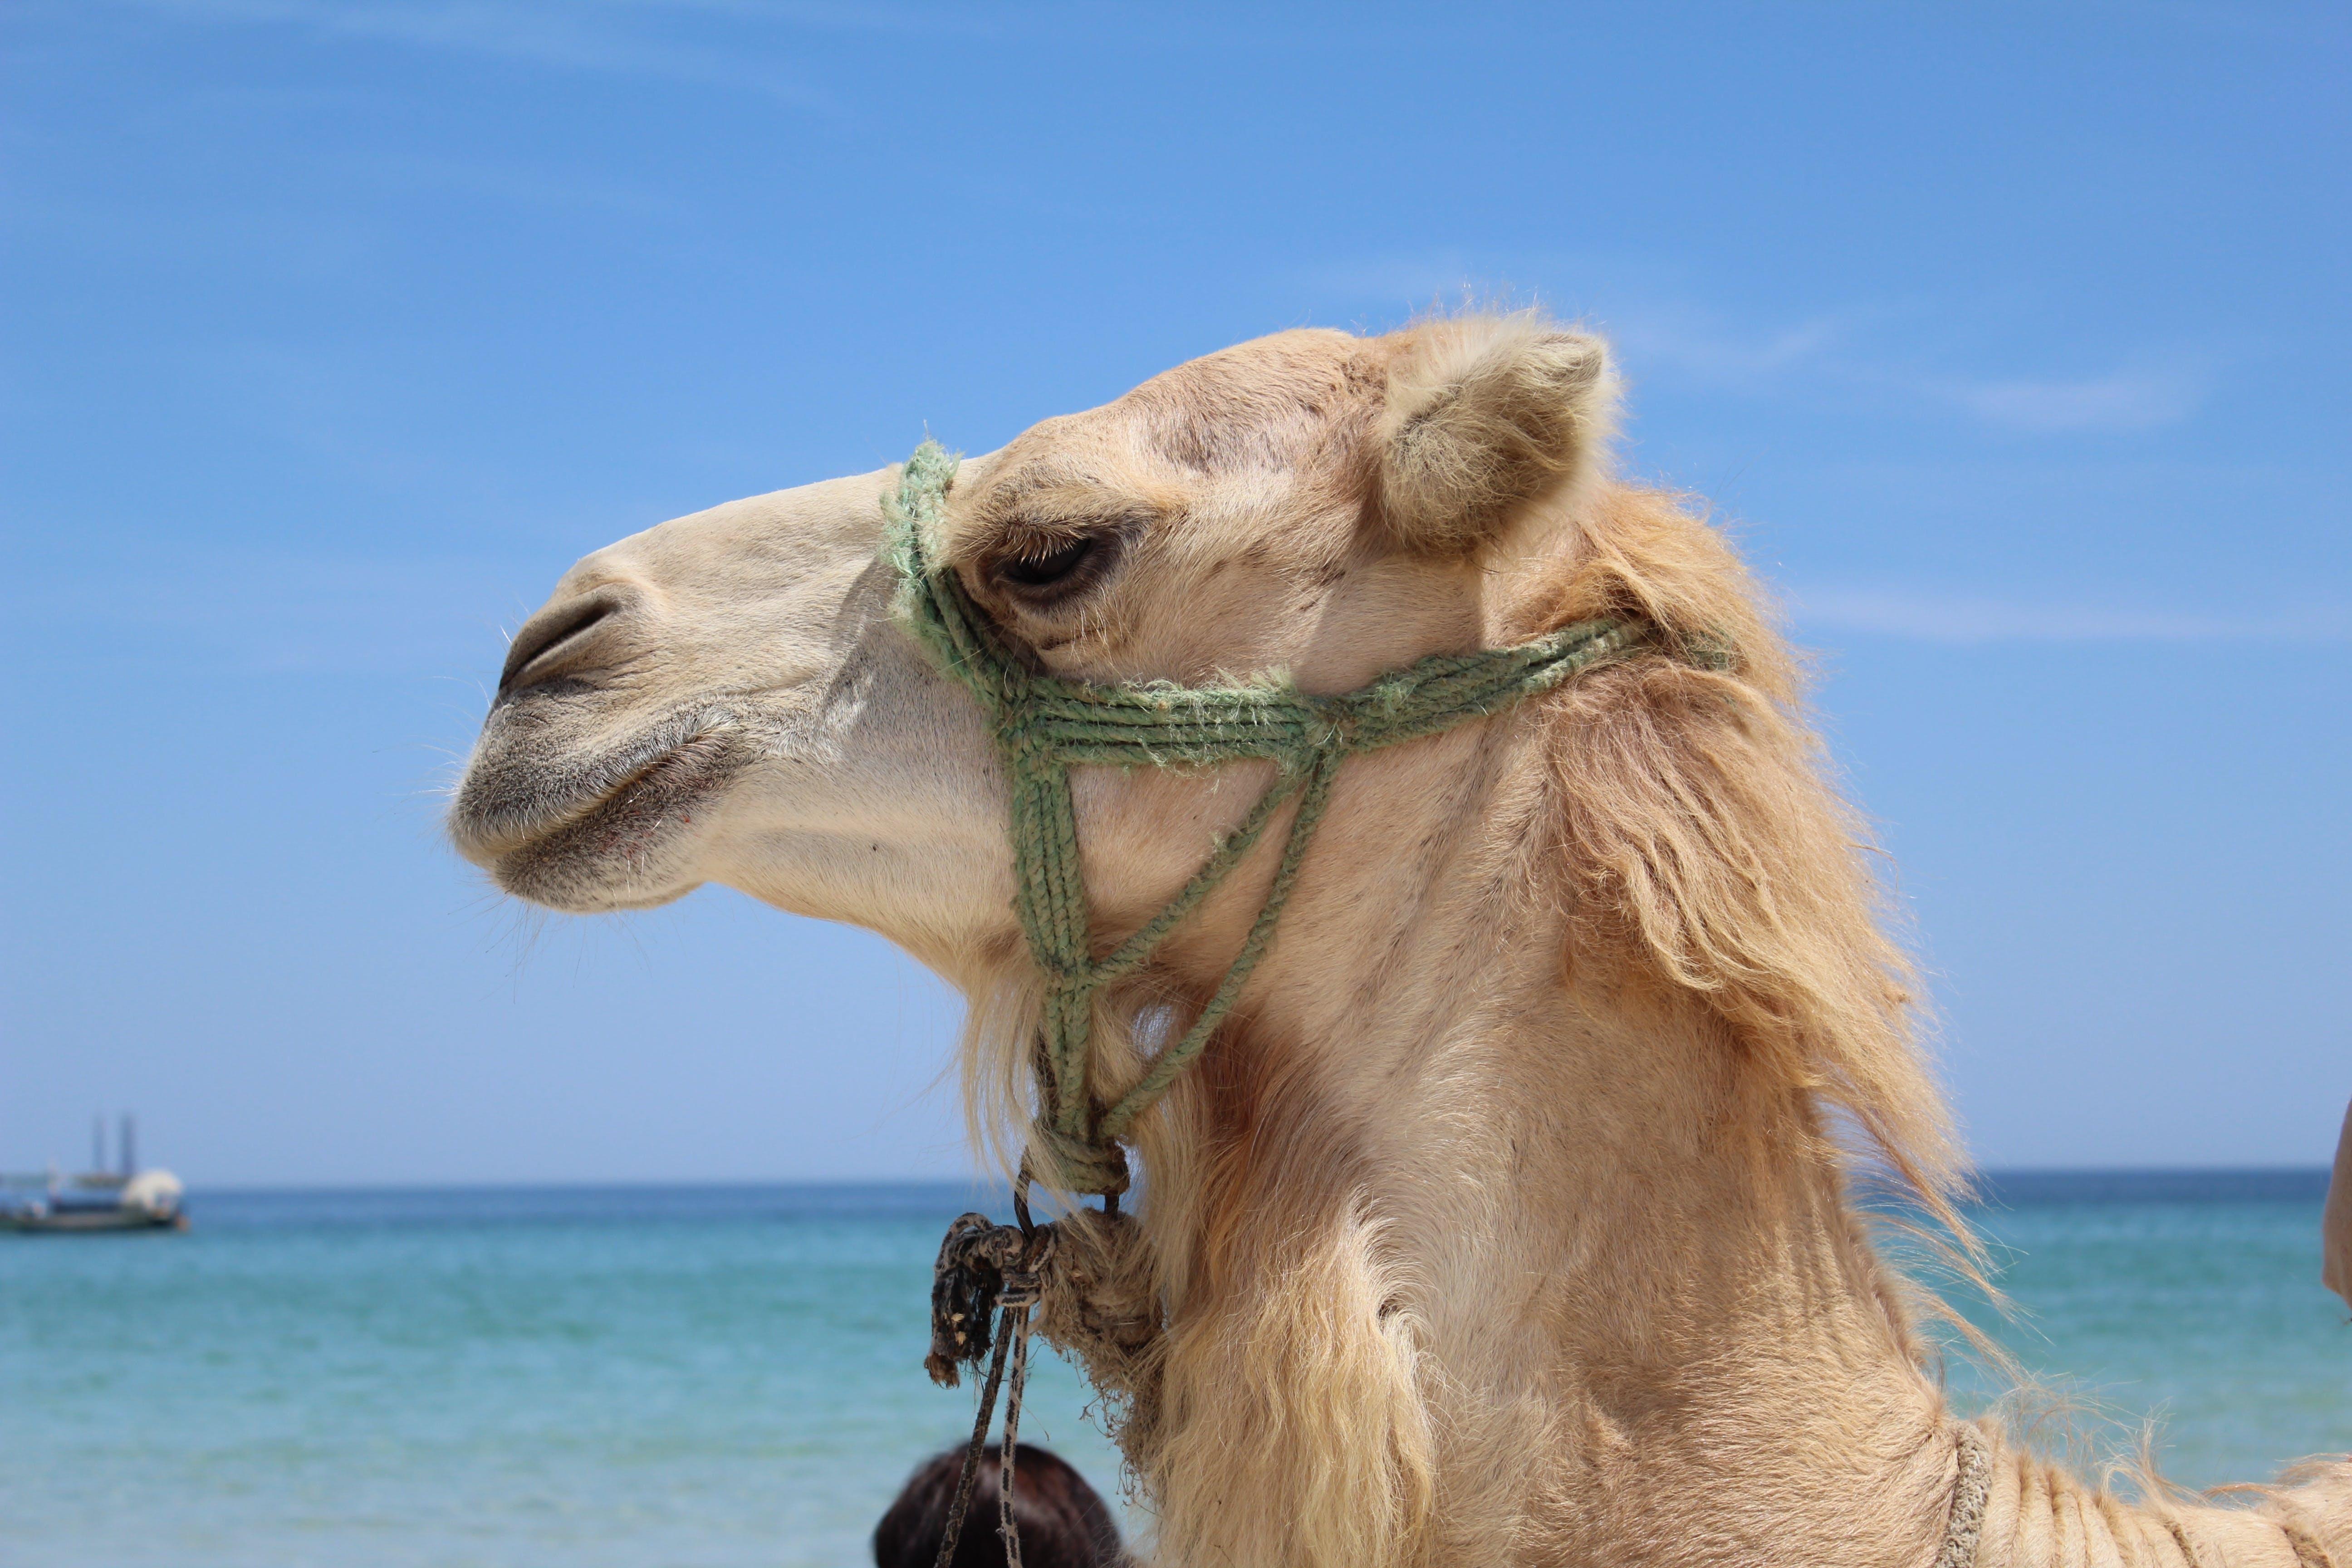 Beige Camel Standing Near Shoreline